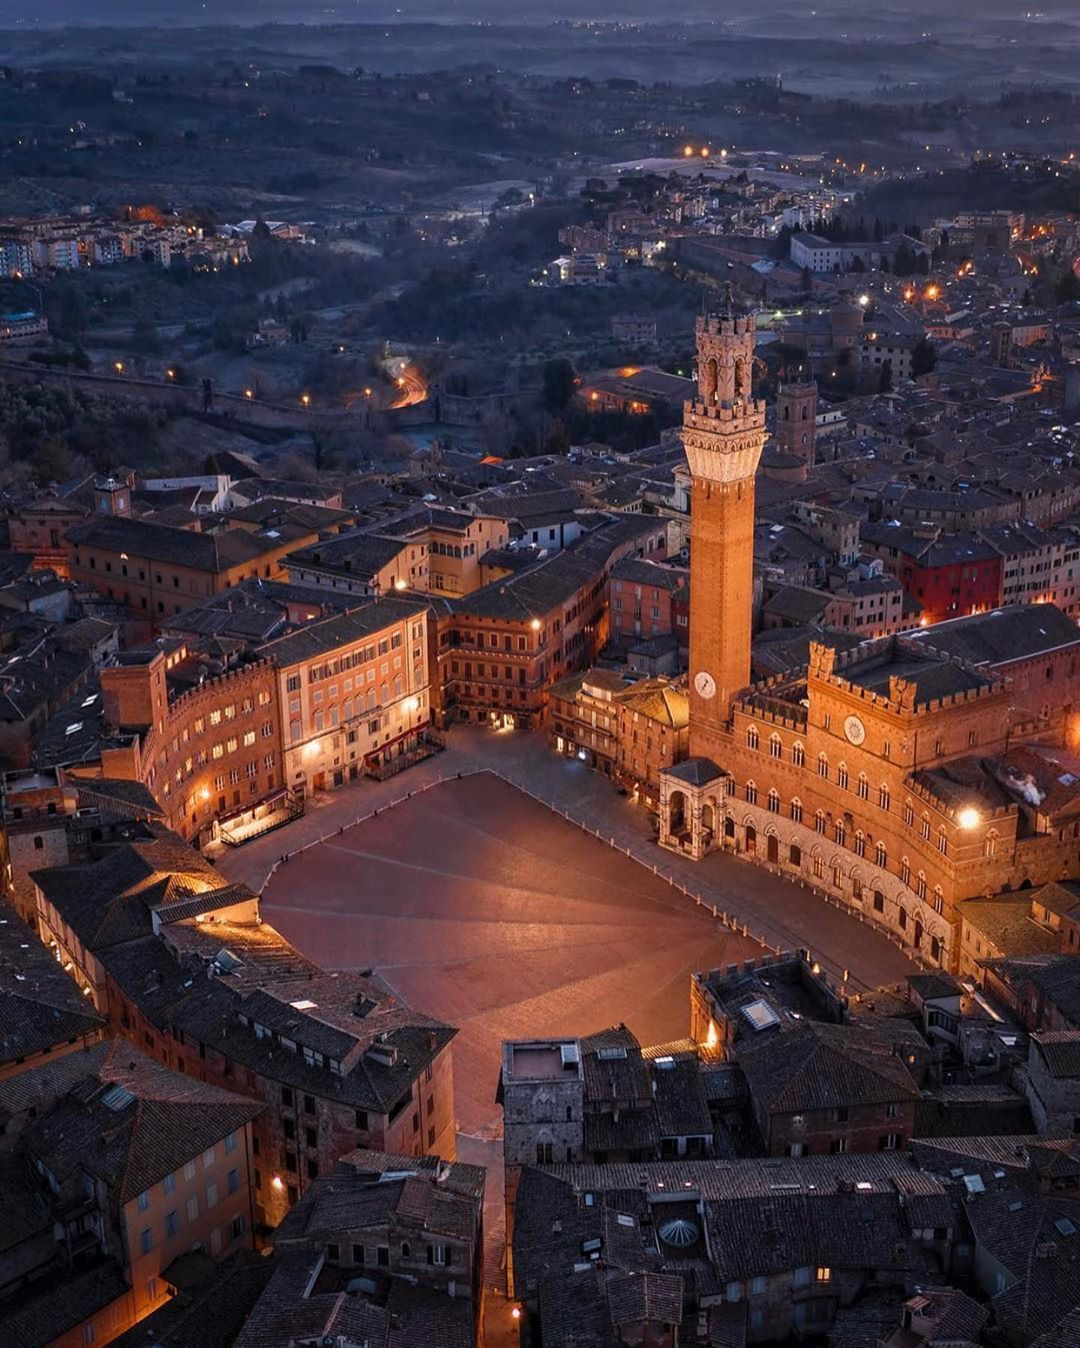 "Italy • Benvenuti a tutti! on Instagram: ""Nights in Siena. 😊✨  📍Siena 📷 @danieleragazzini · · · · #Italy #Italia #Italian #ItalianGirl #ItalianFood #visititalia #roma #rome…"""